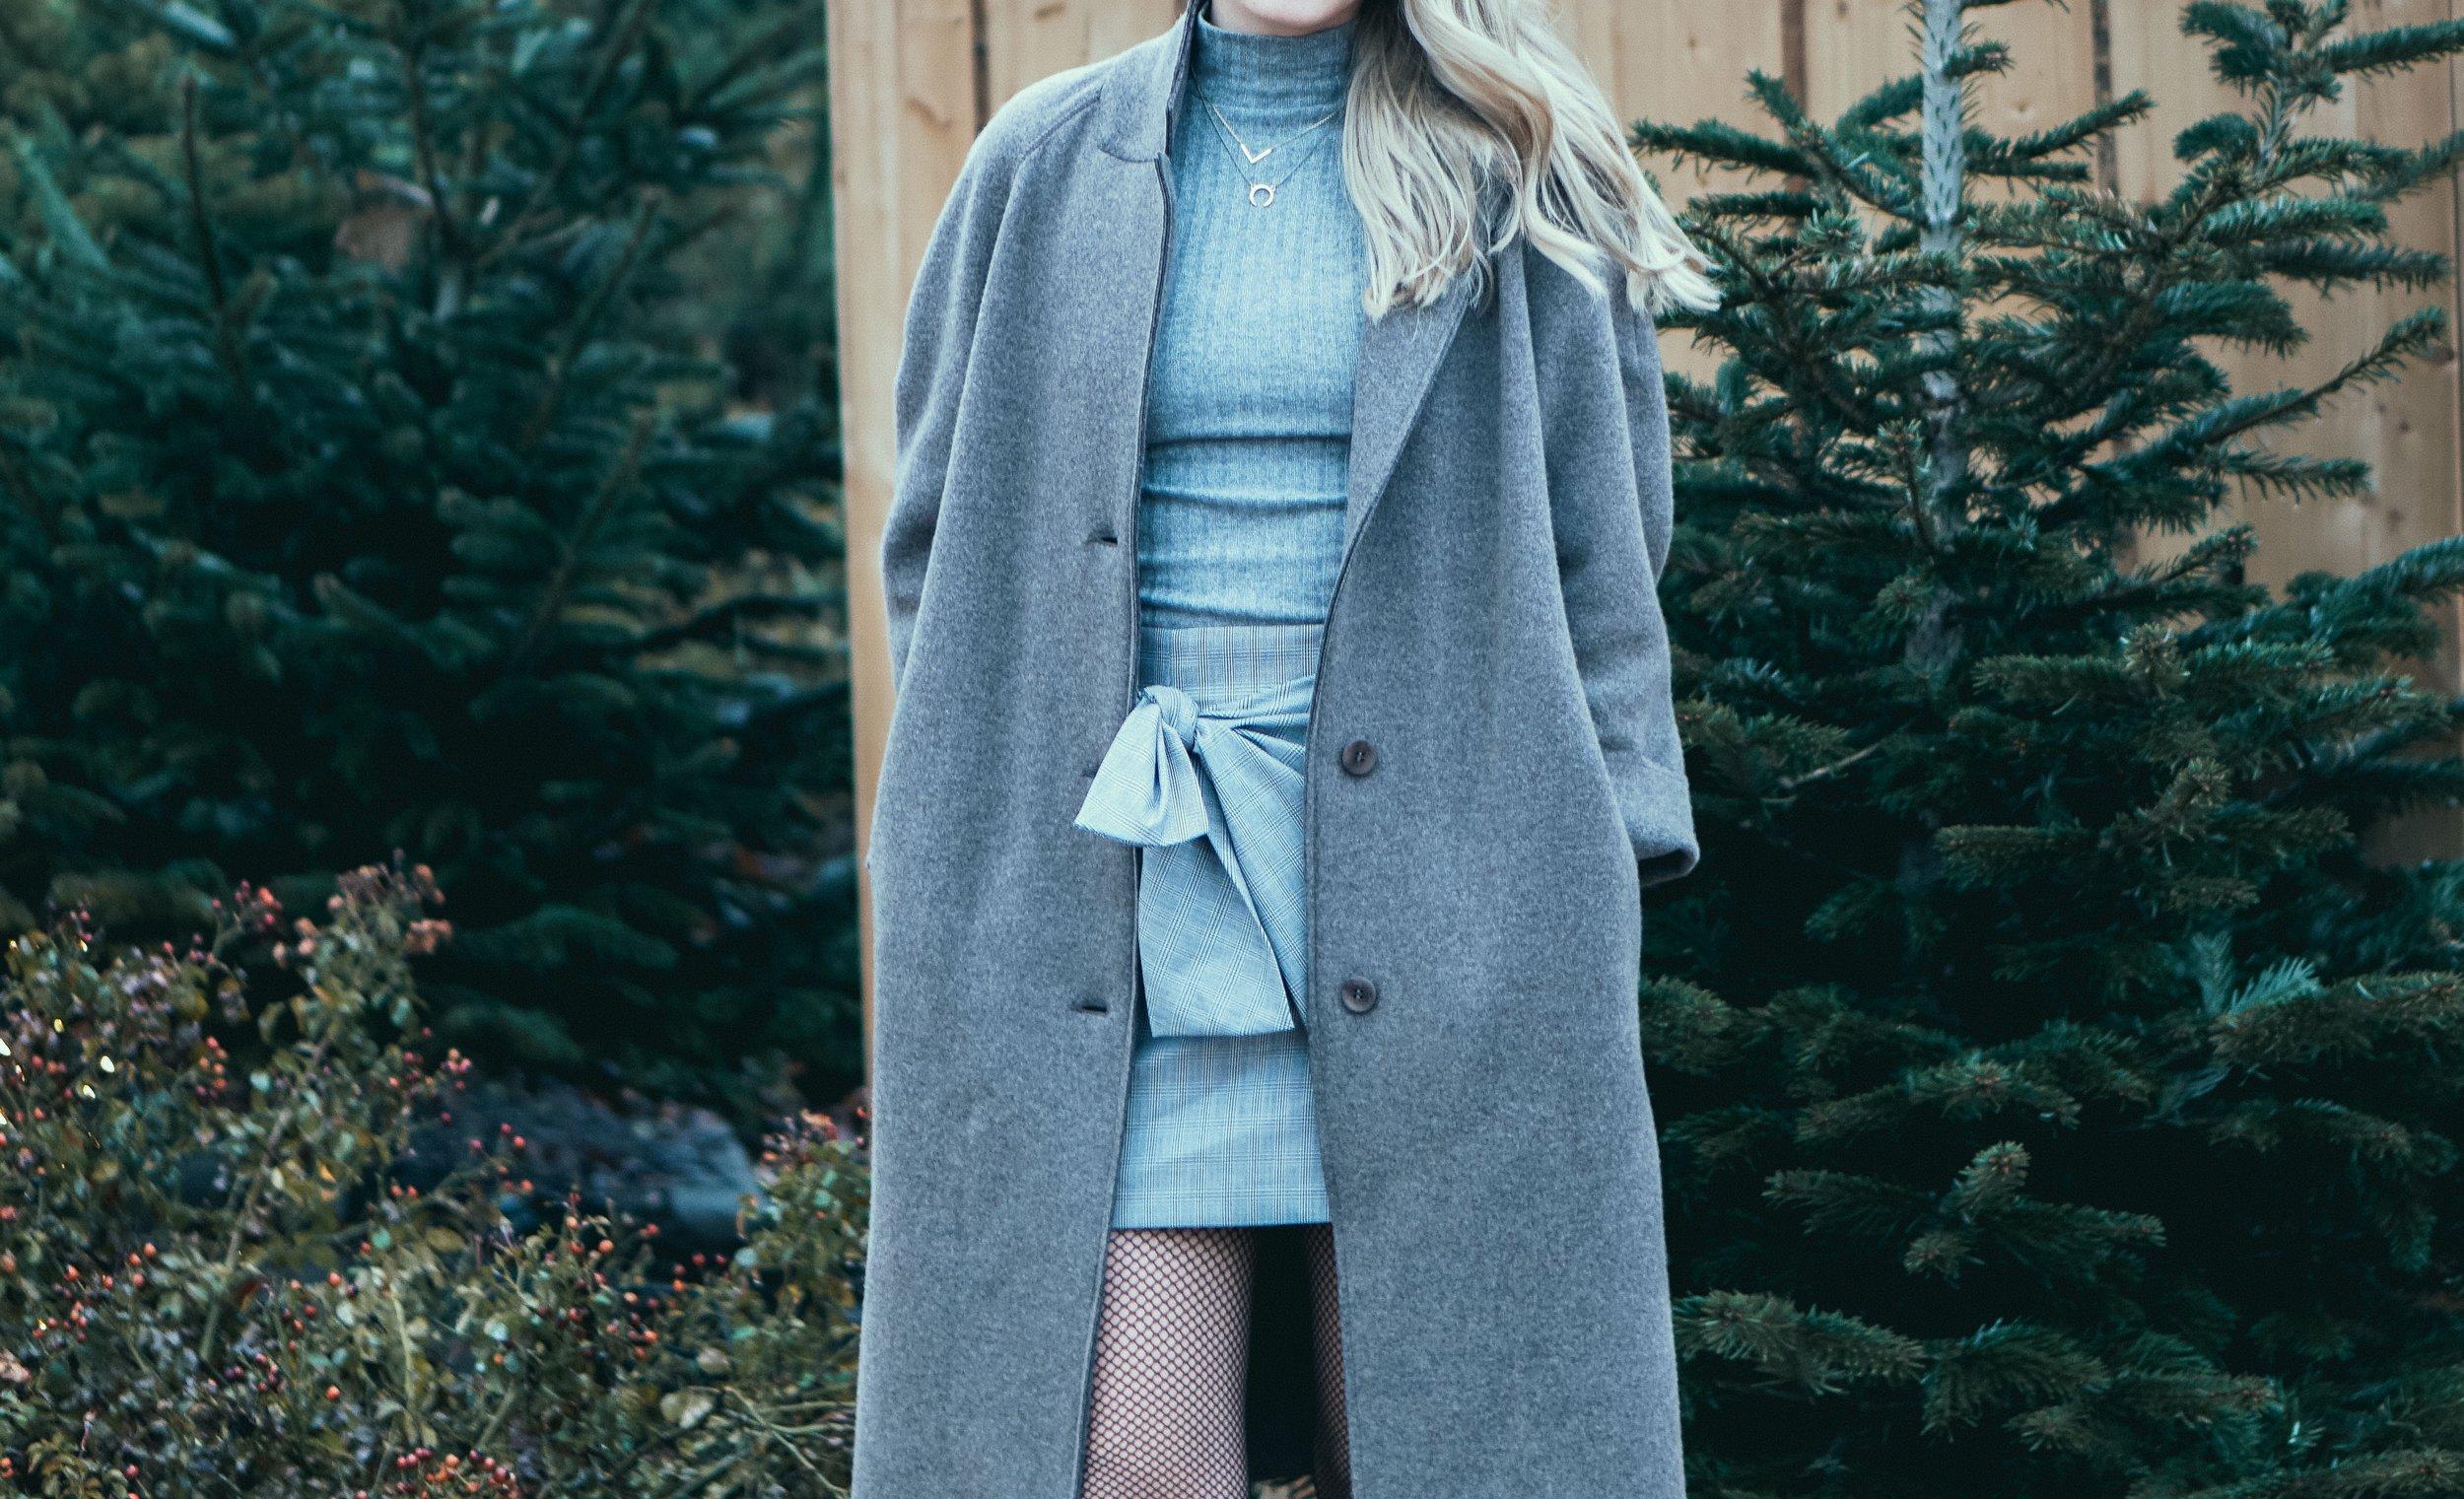 Holiday fashion outfit closeup